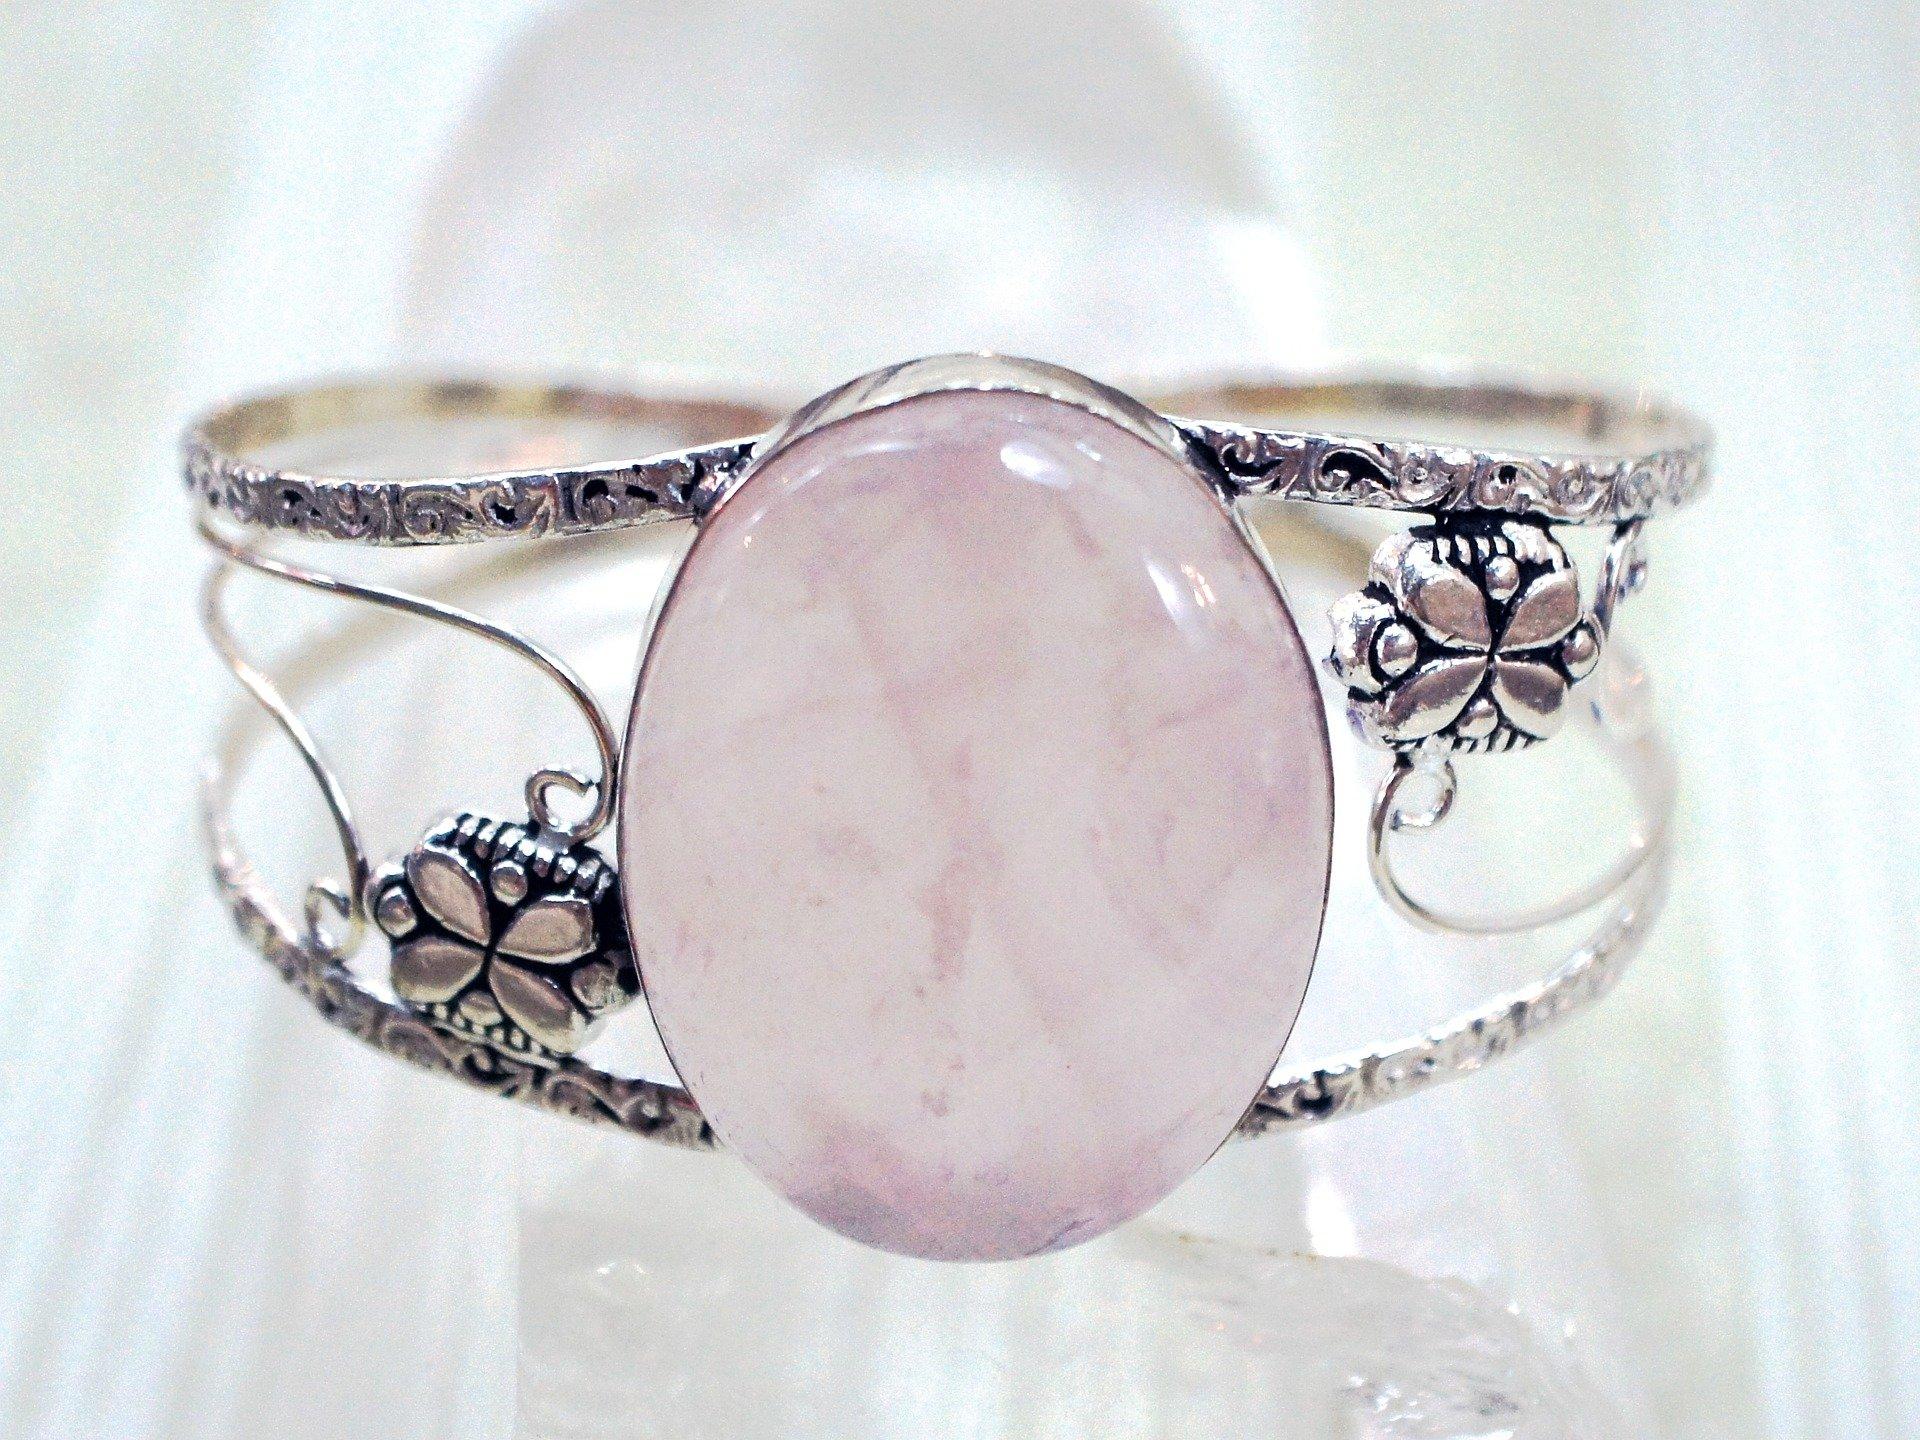 jewelry-665330_1920